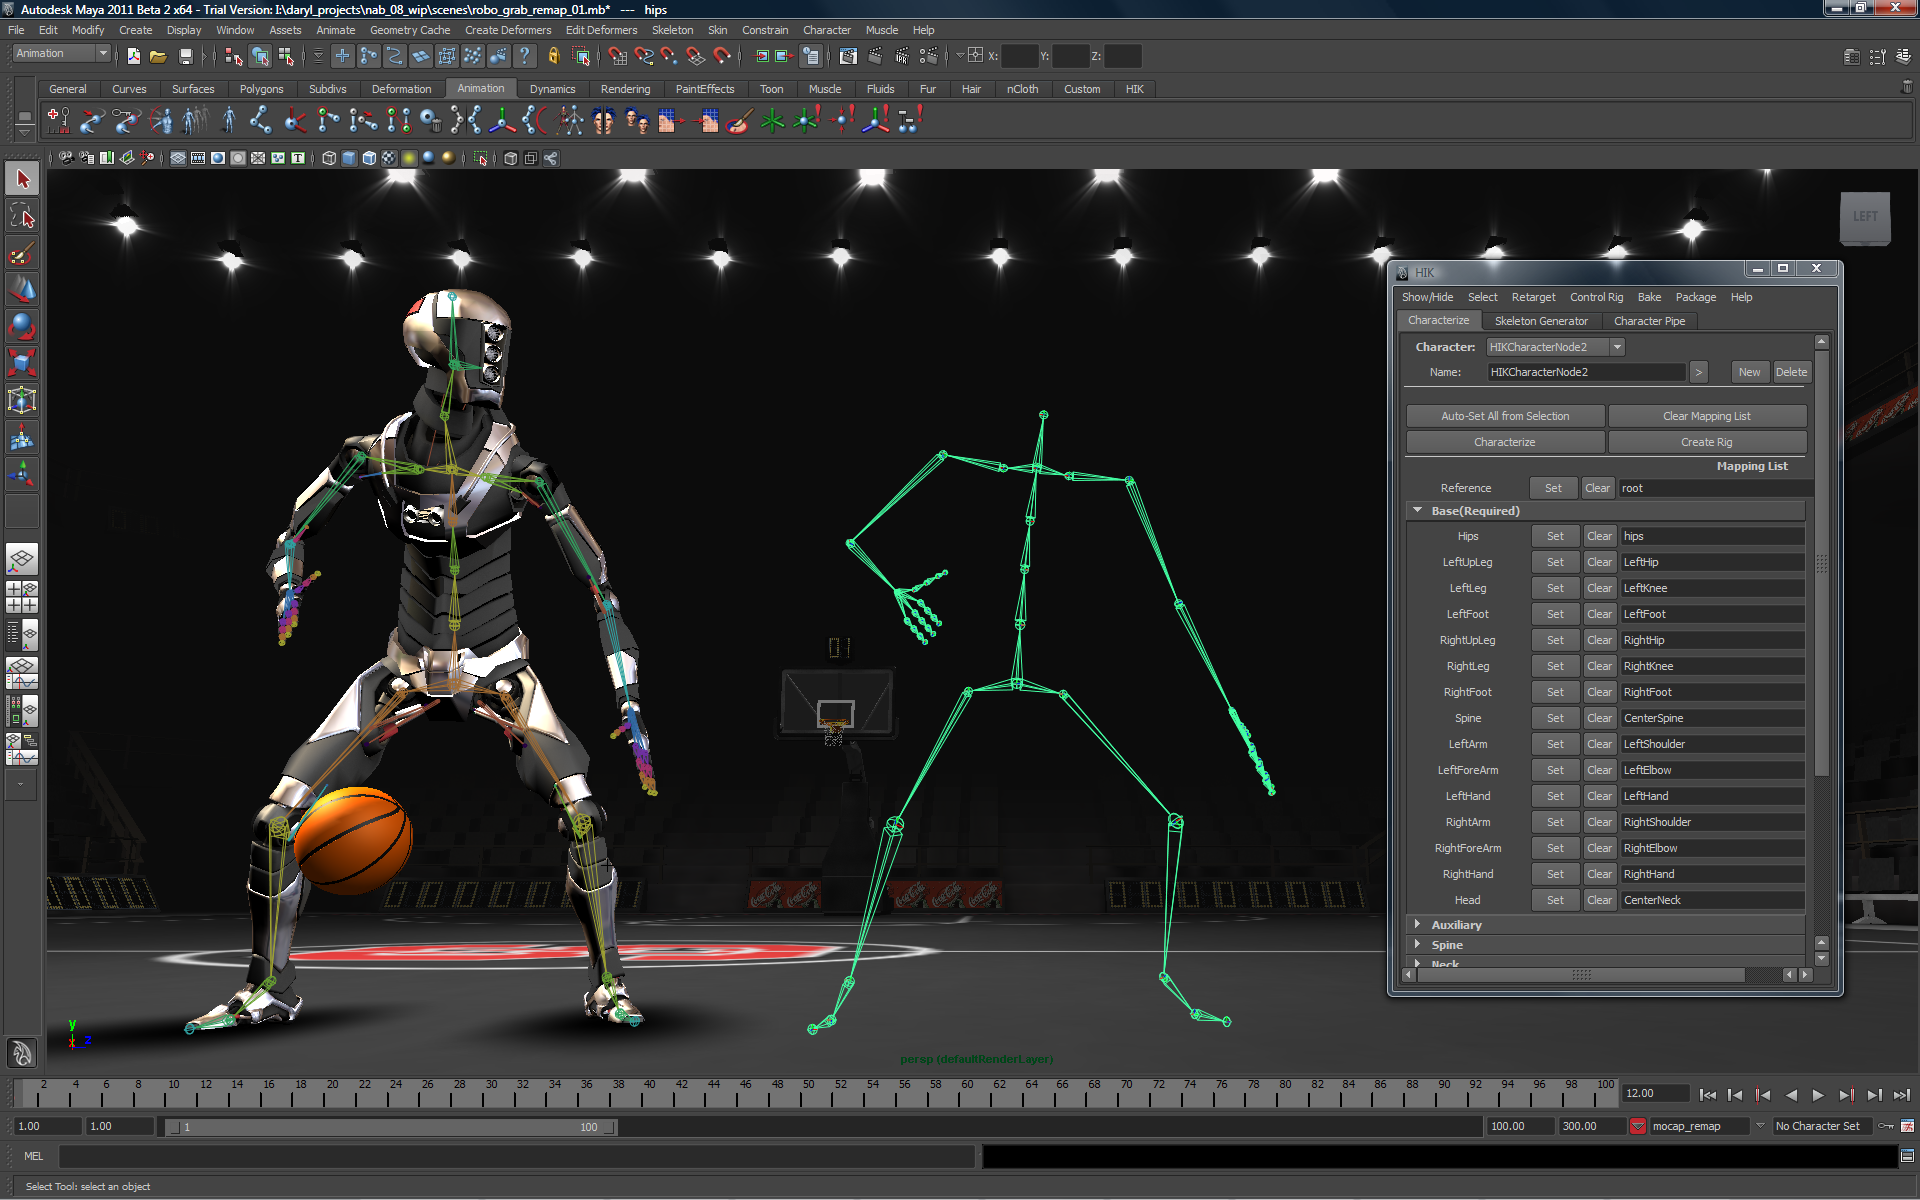 Animated 3d wallpaper jarvis interface - Autodesk Maya